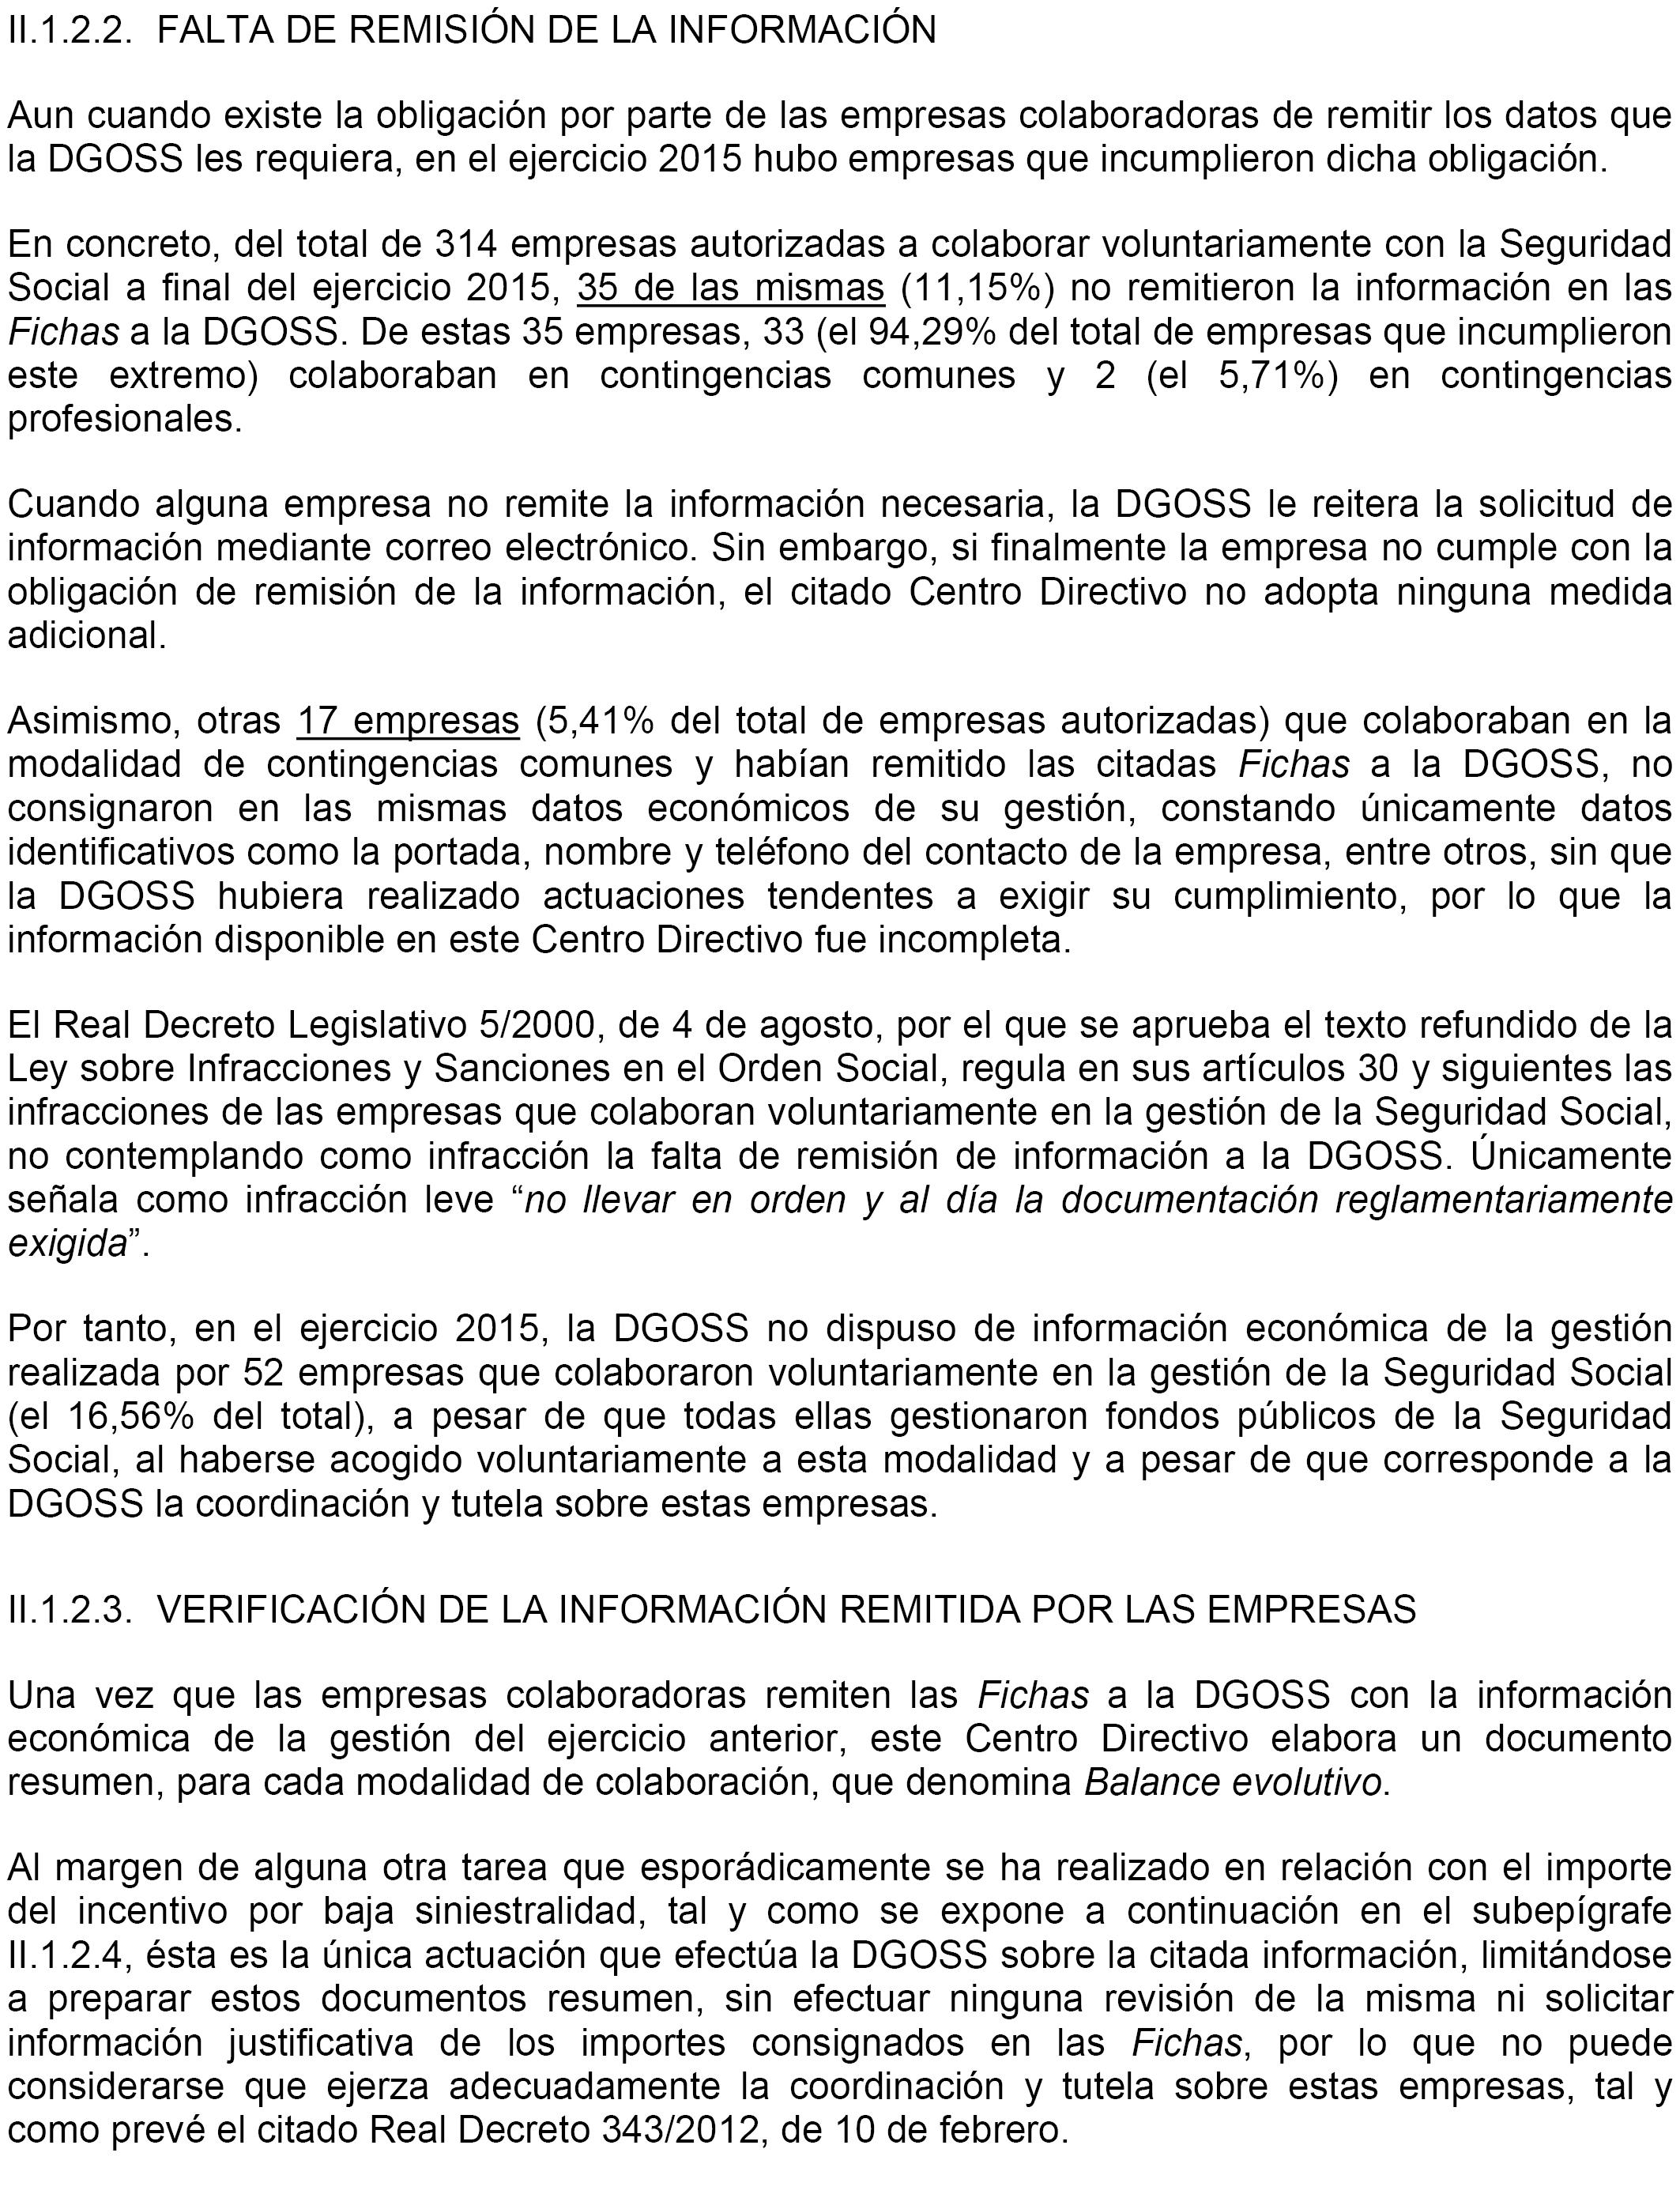 BOE.es - Documento BOE-A-2018-11560